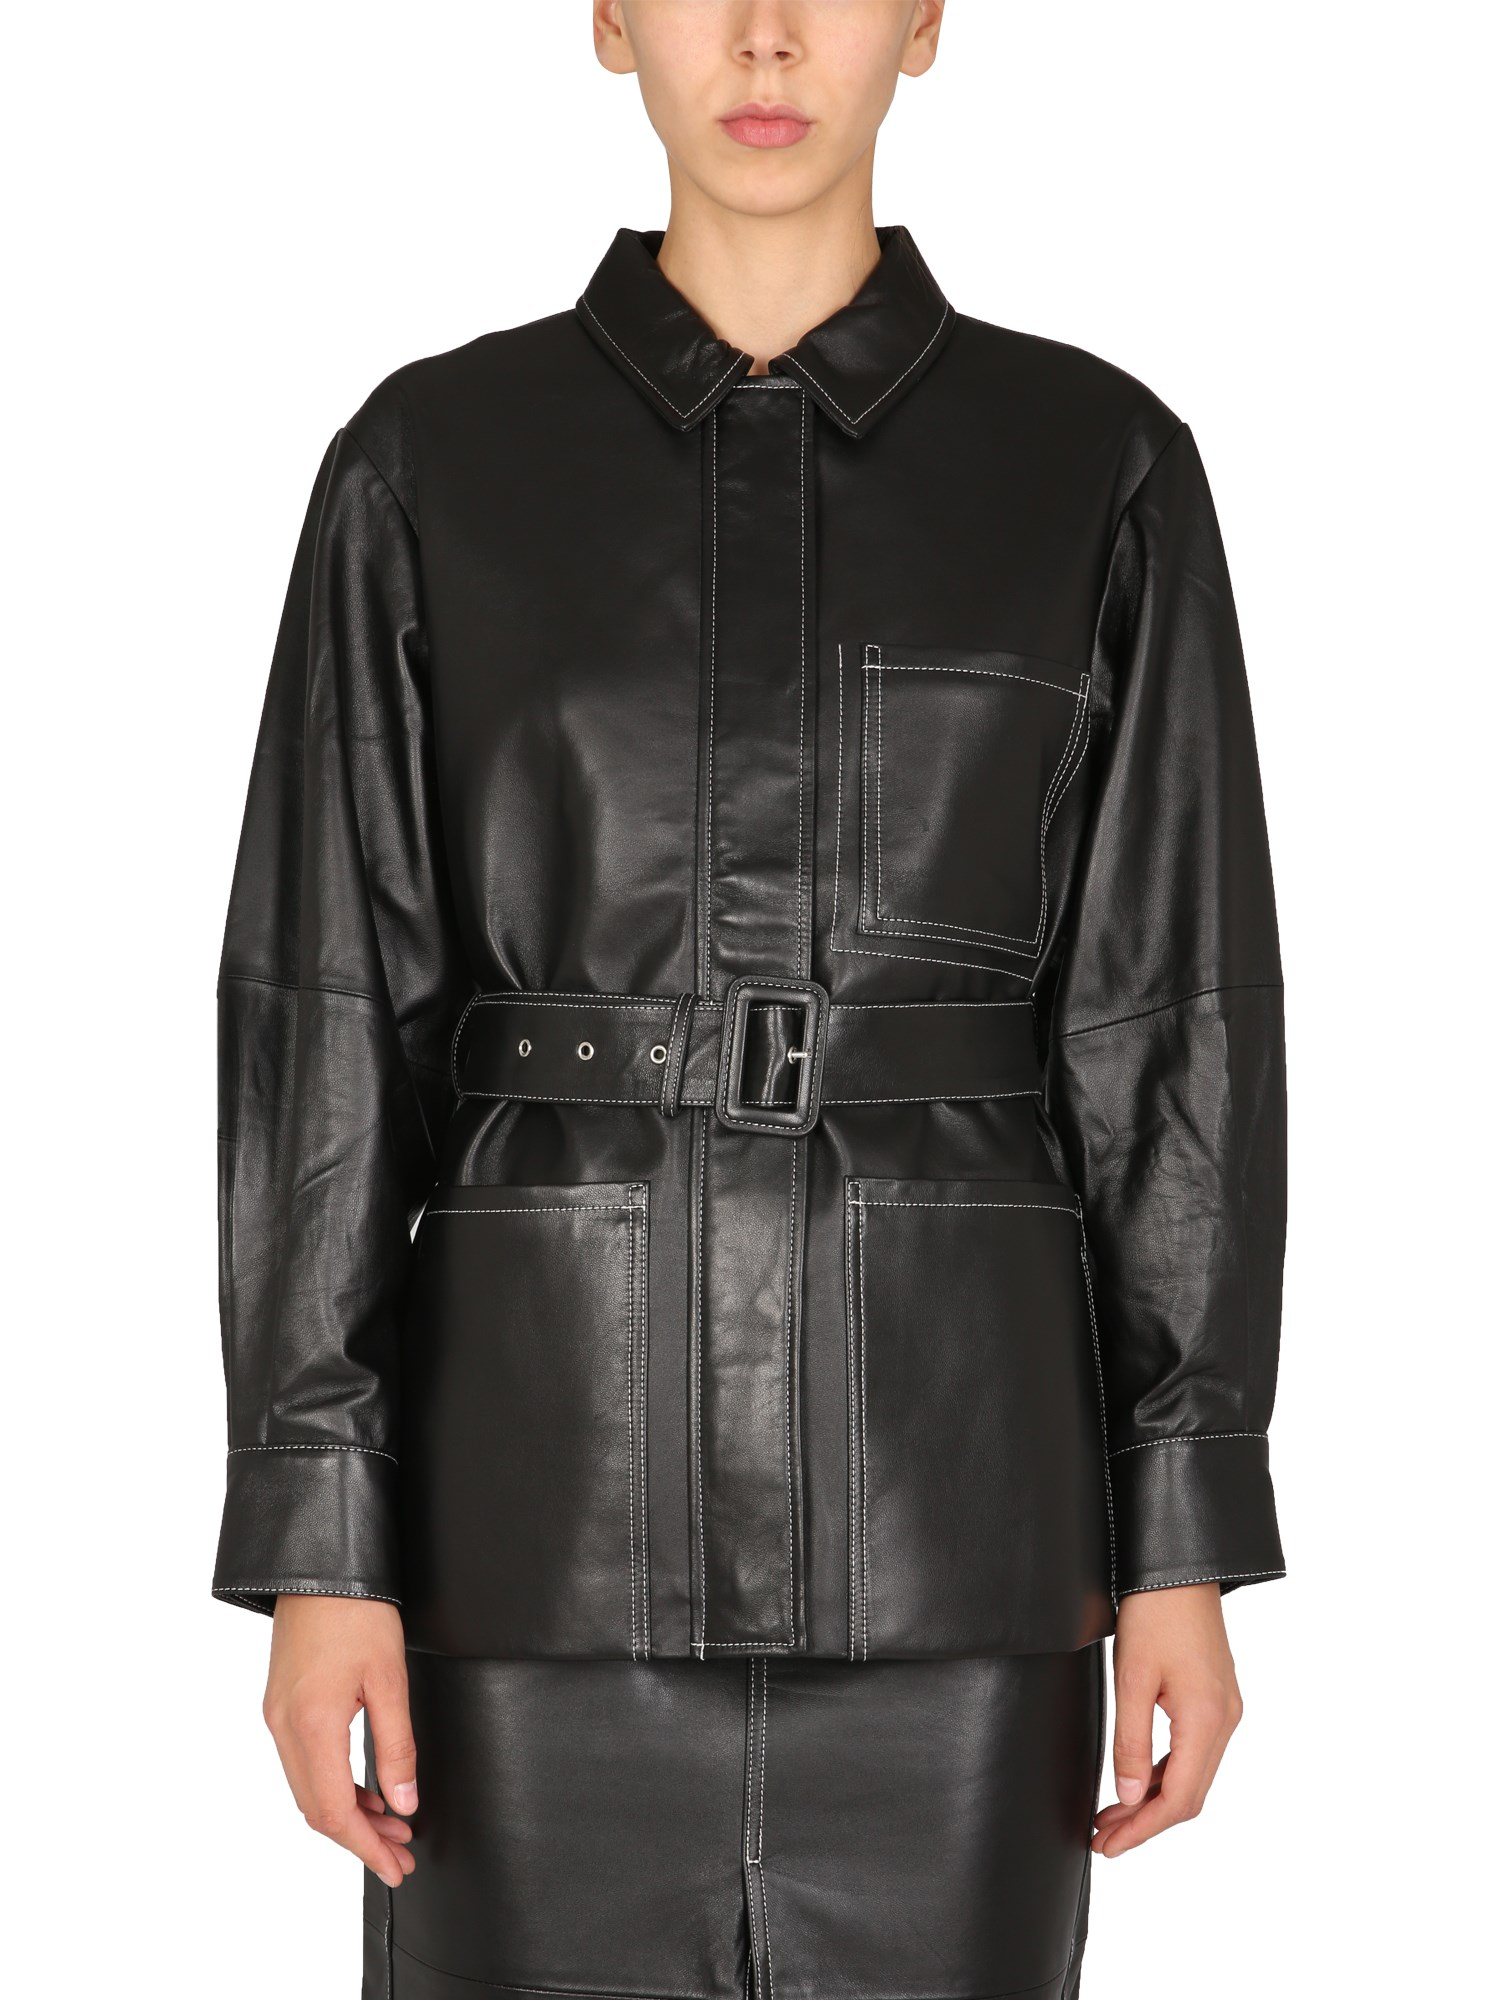 Nappa leather jacket - proenza schouler white label - Modalova